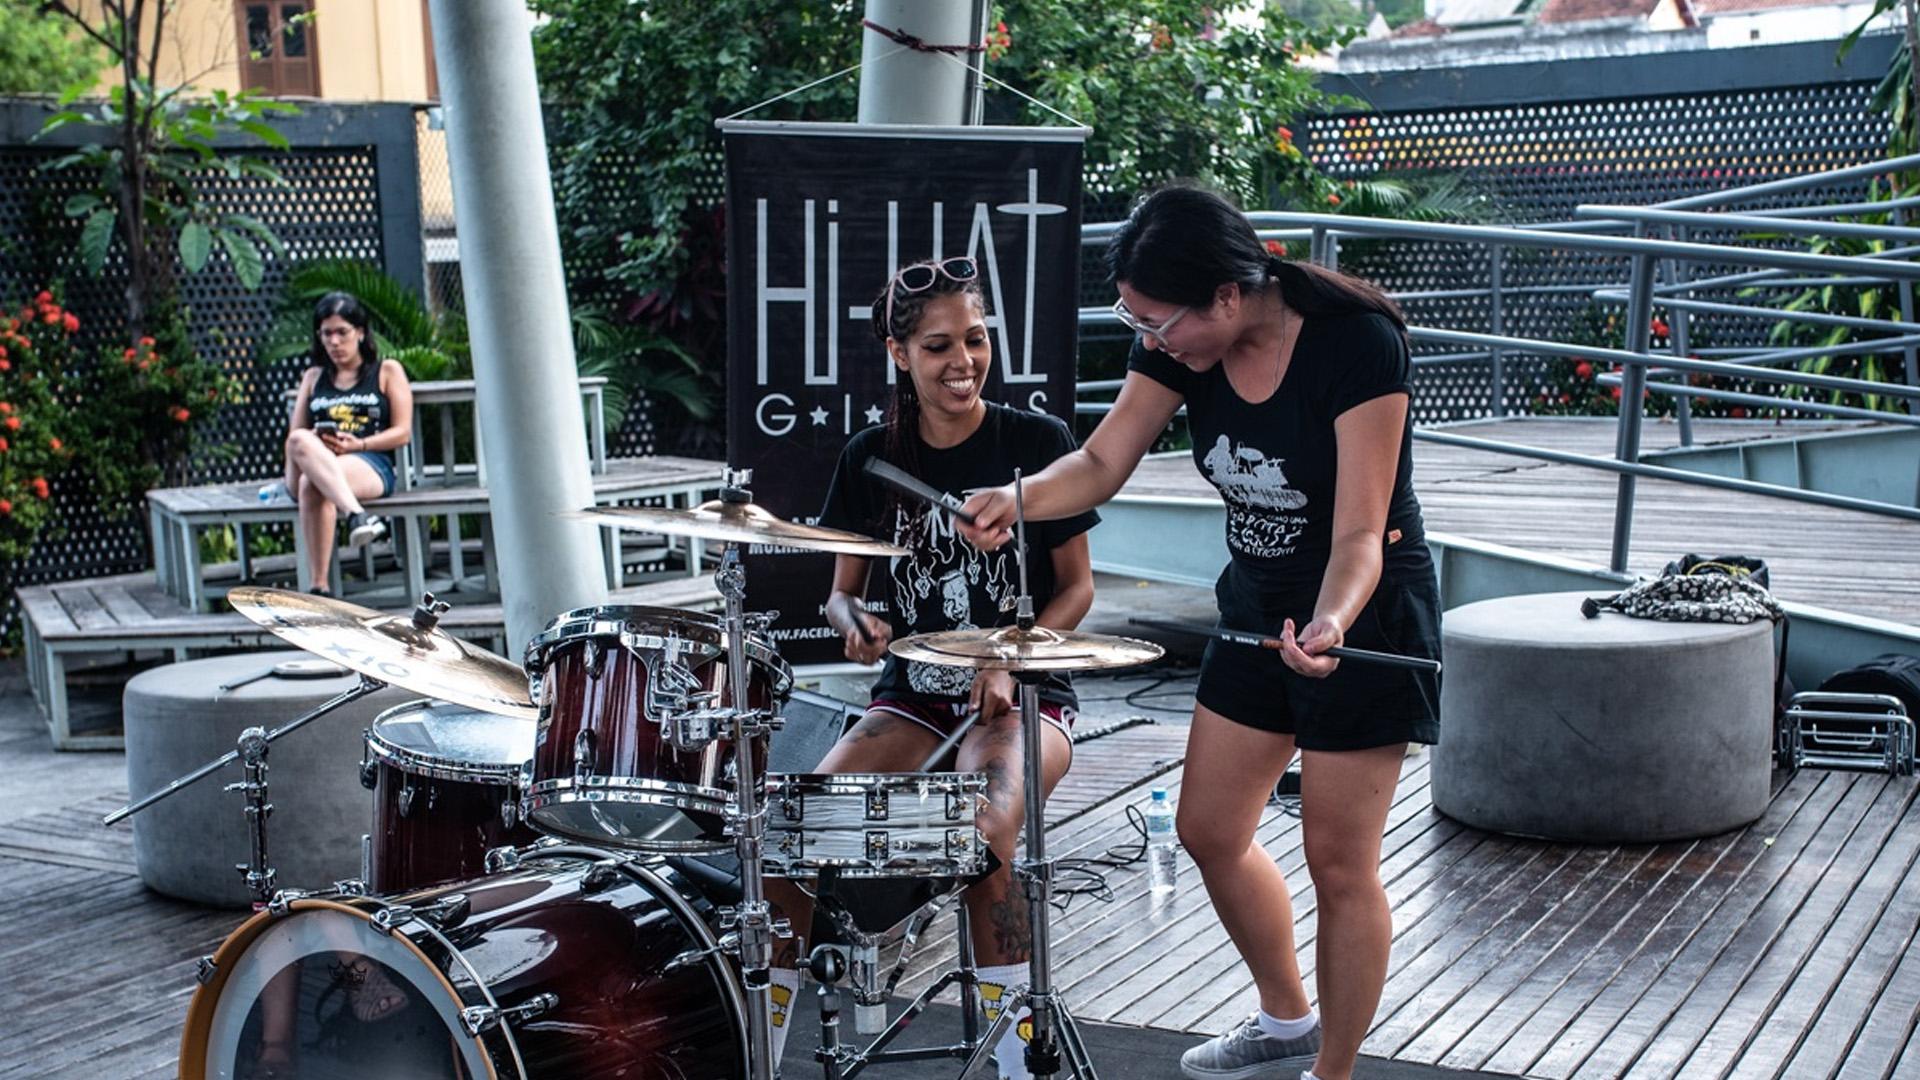 Hi Hat Girls